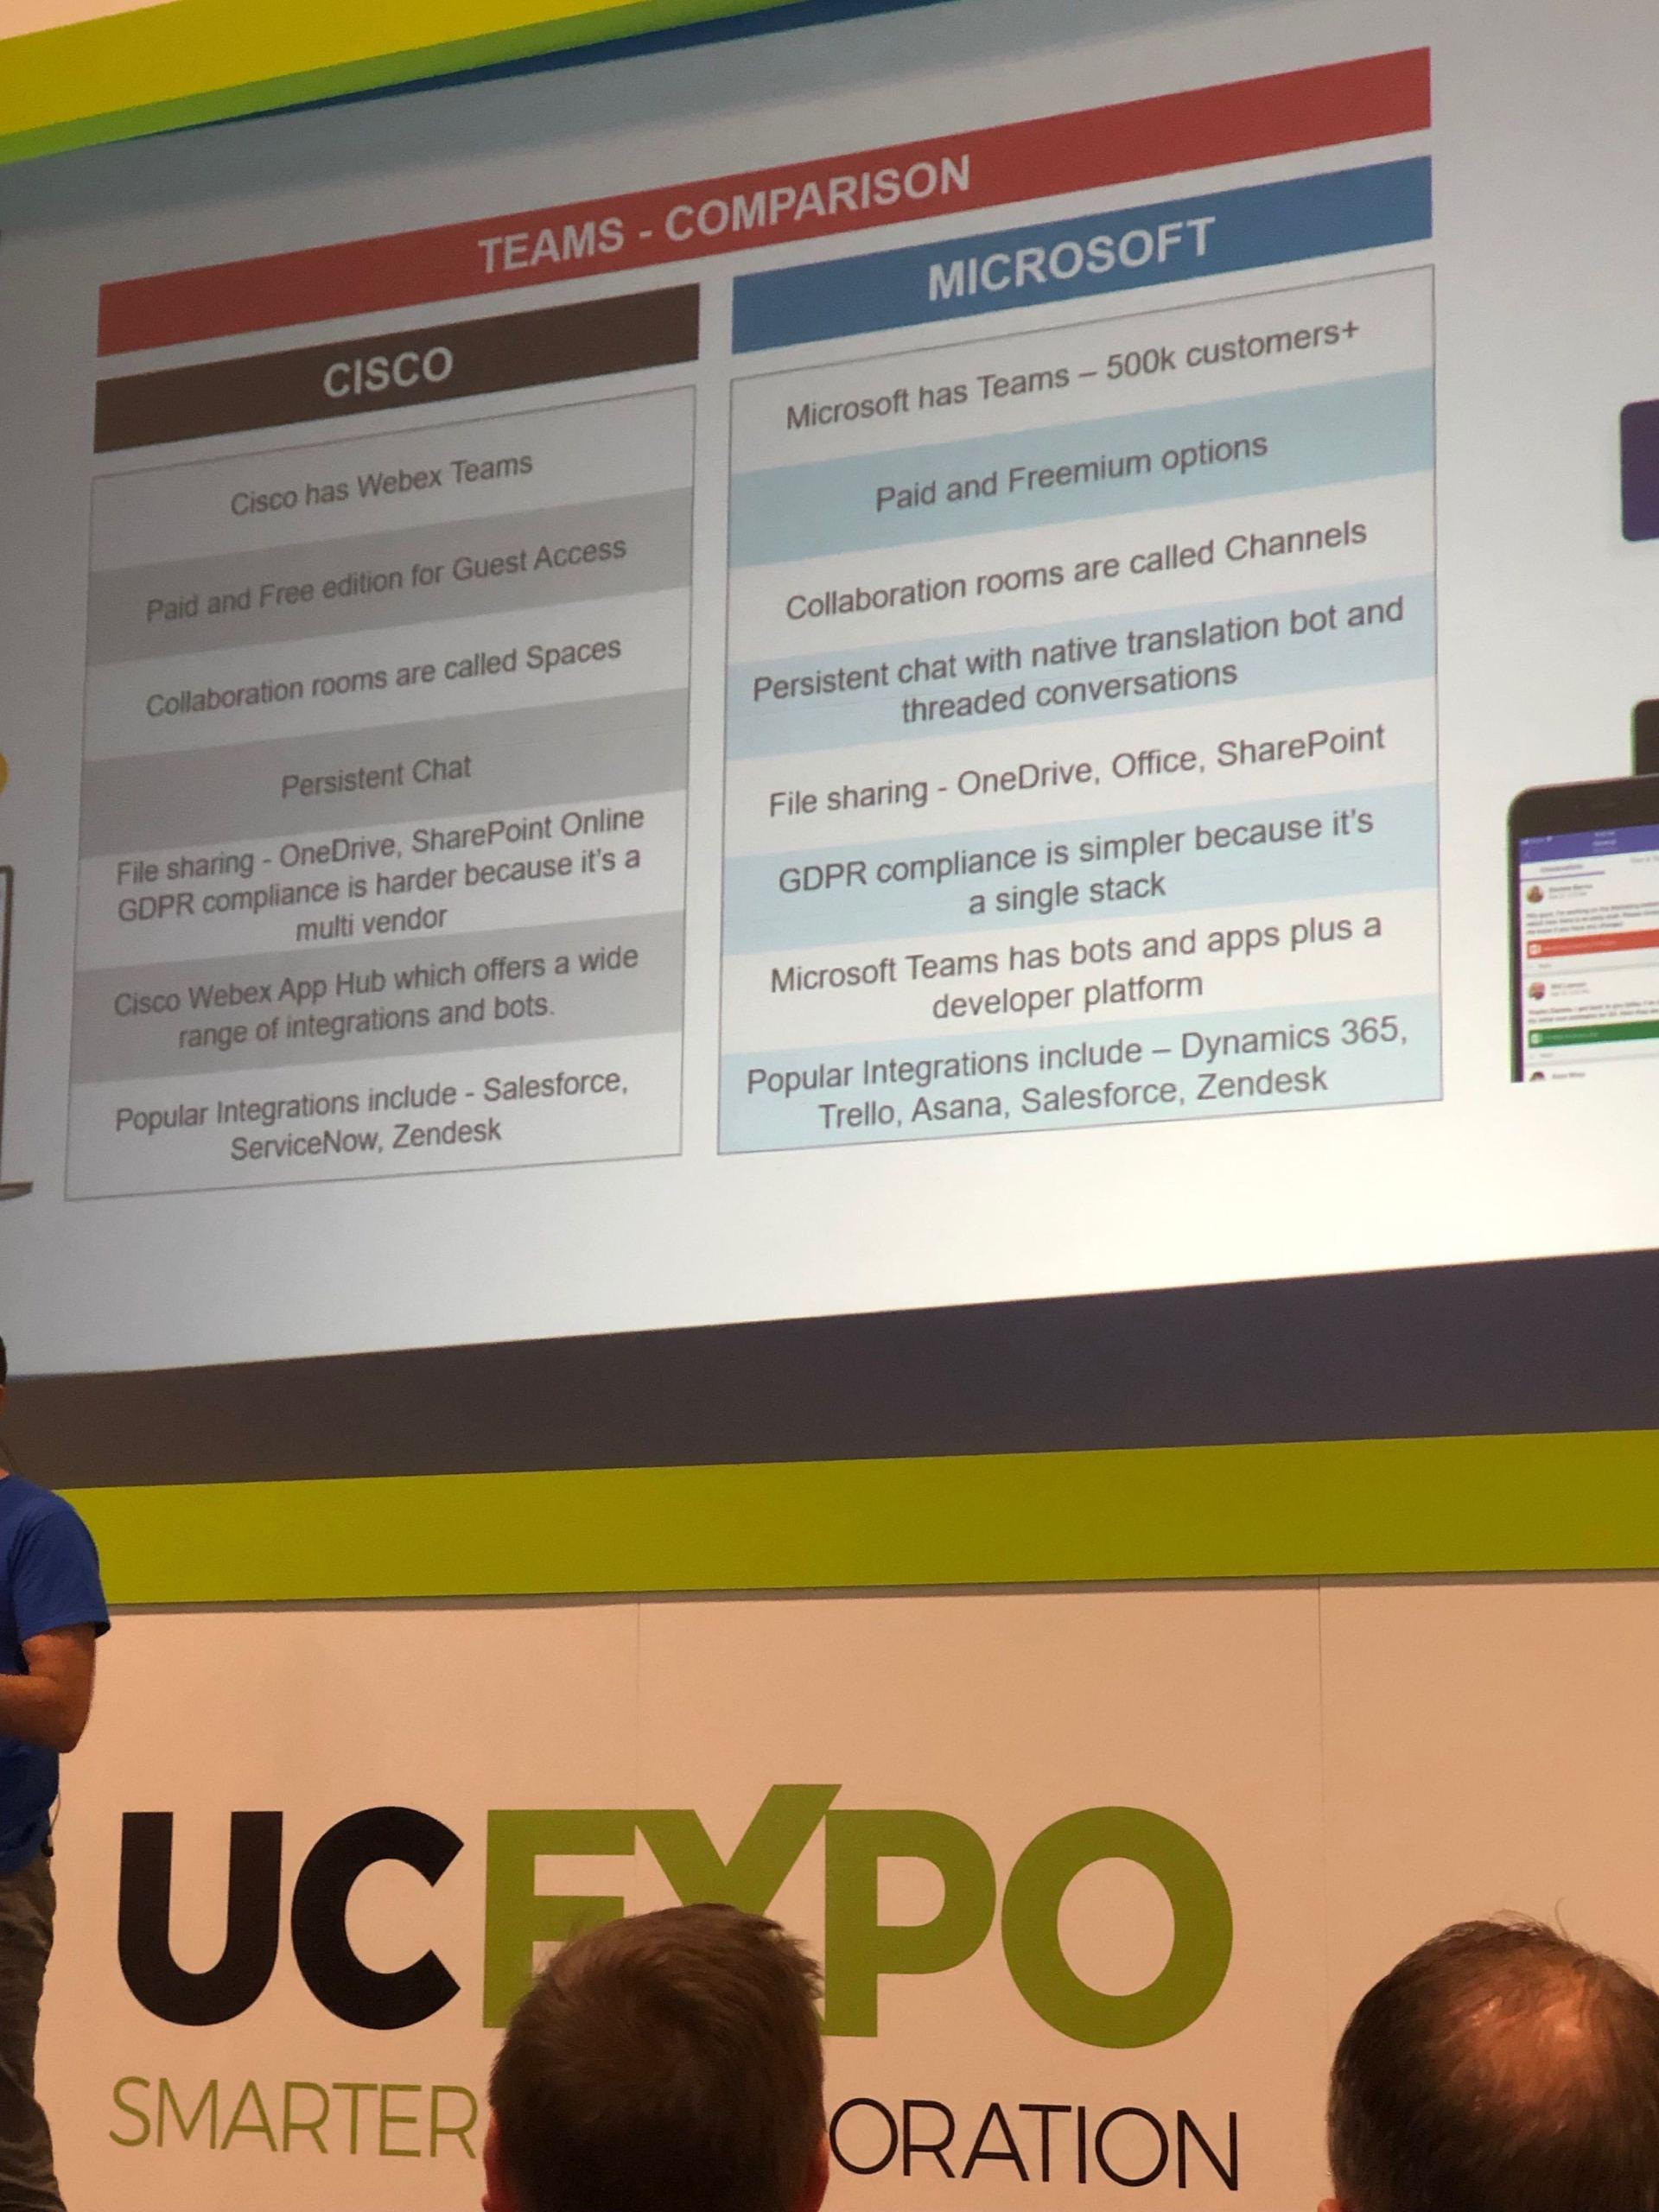 Comparing Microsoft Teams and Cisco Webex Teams ta UC Expo